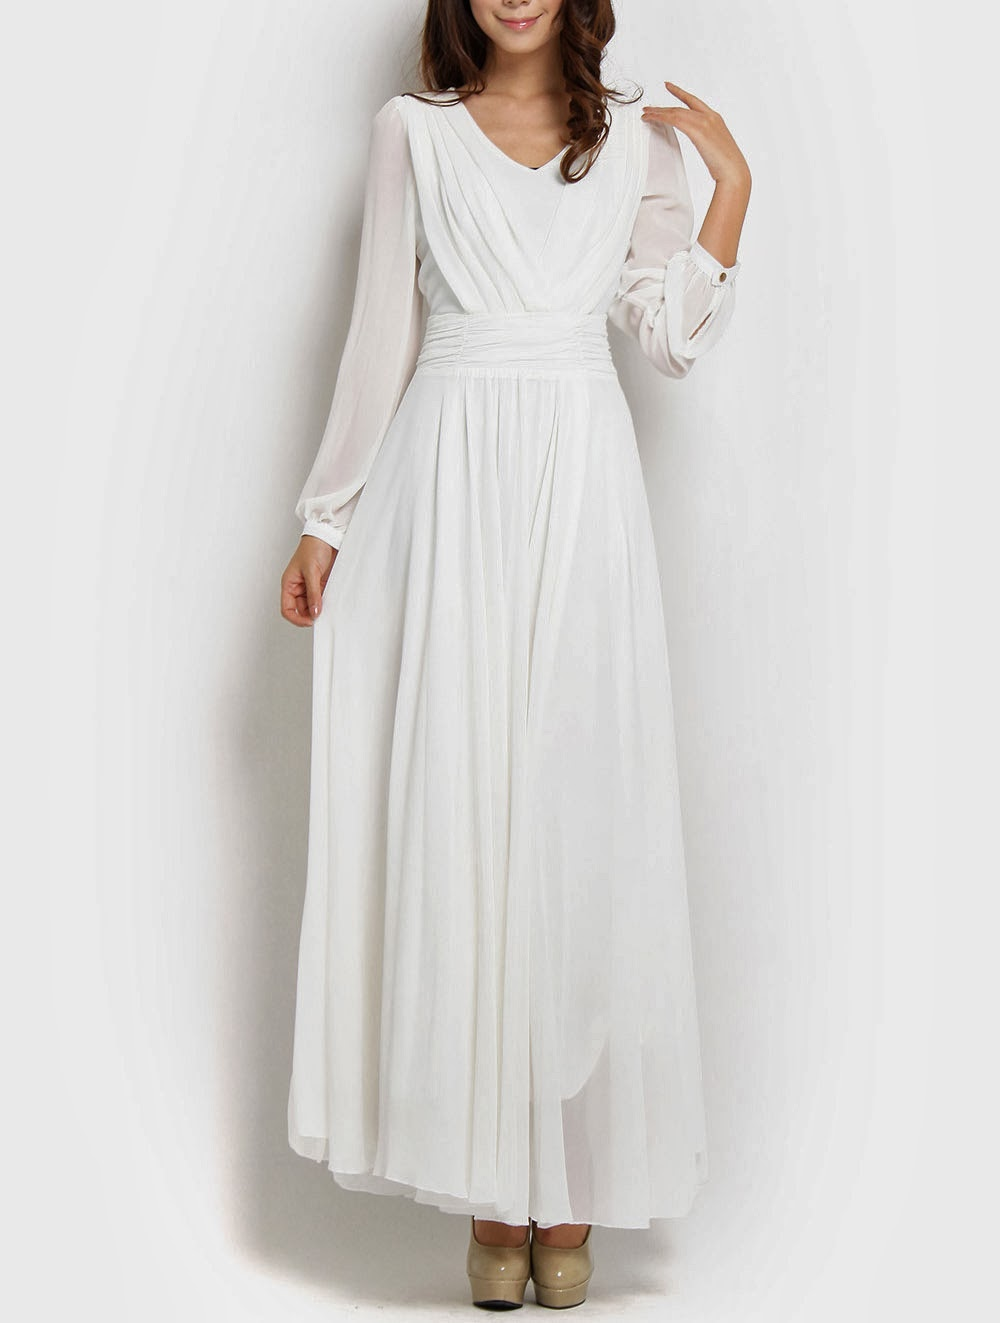 Duchess Fashion Malaysia Online Clothes Shopping Long